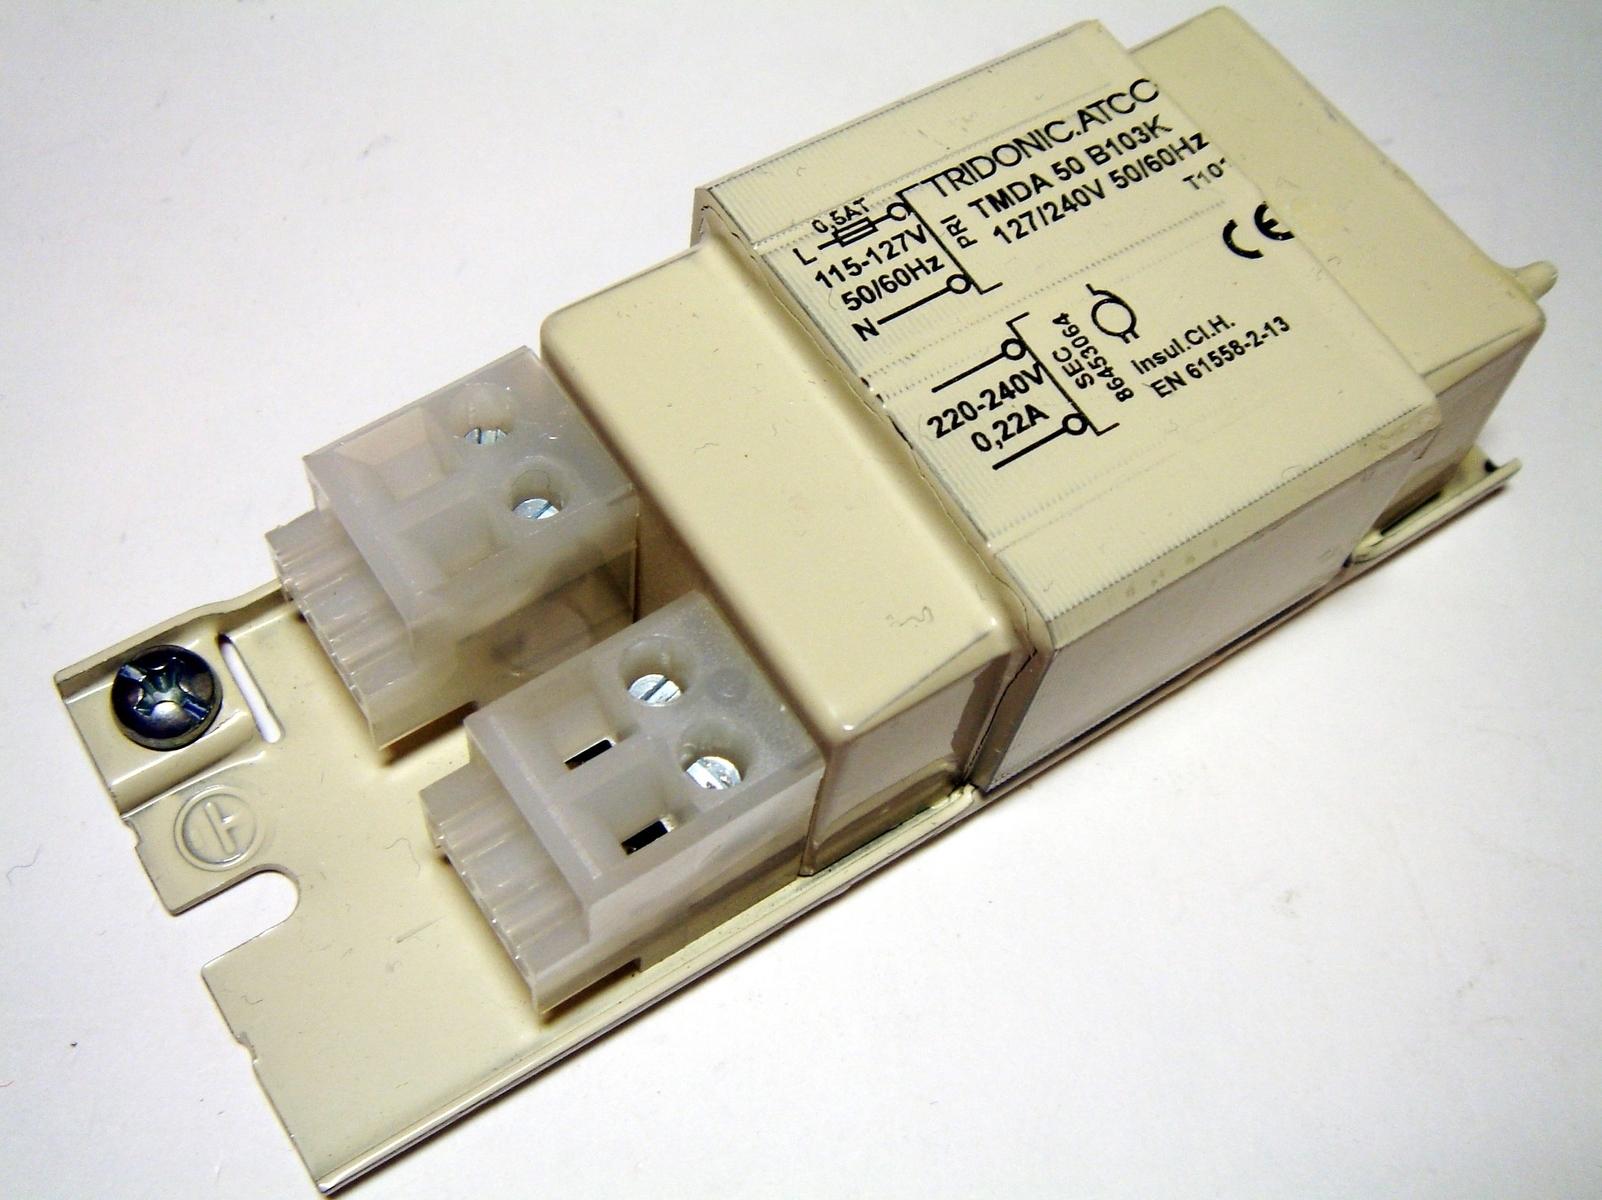 Mehaaniline trafo 50 W, TMDA 50 B103K 127/240V, Tridonic Atco, 86453064